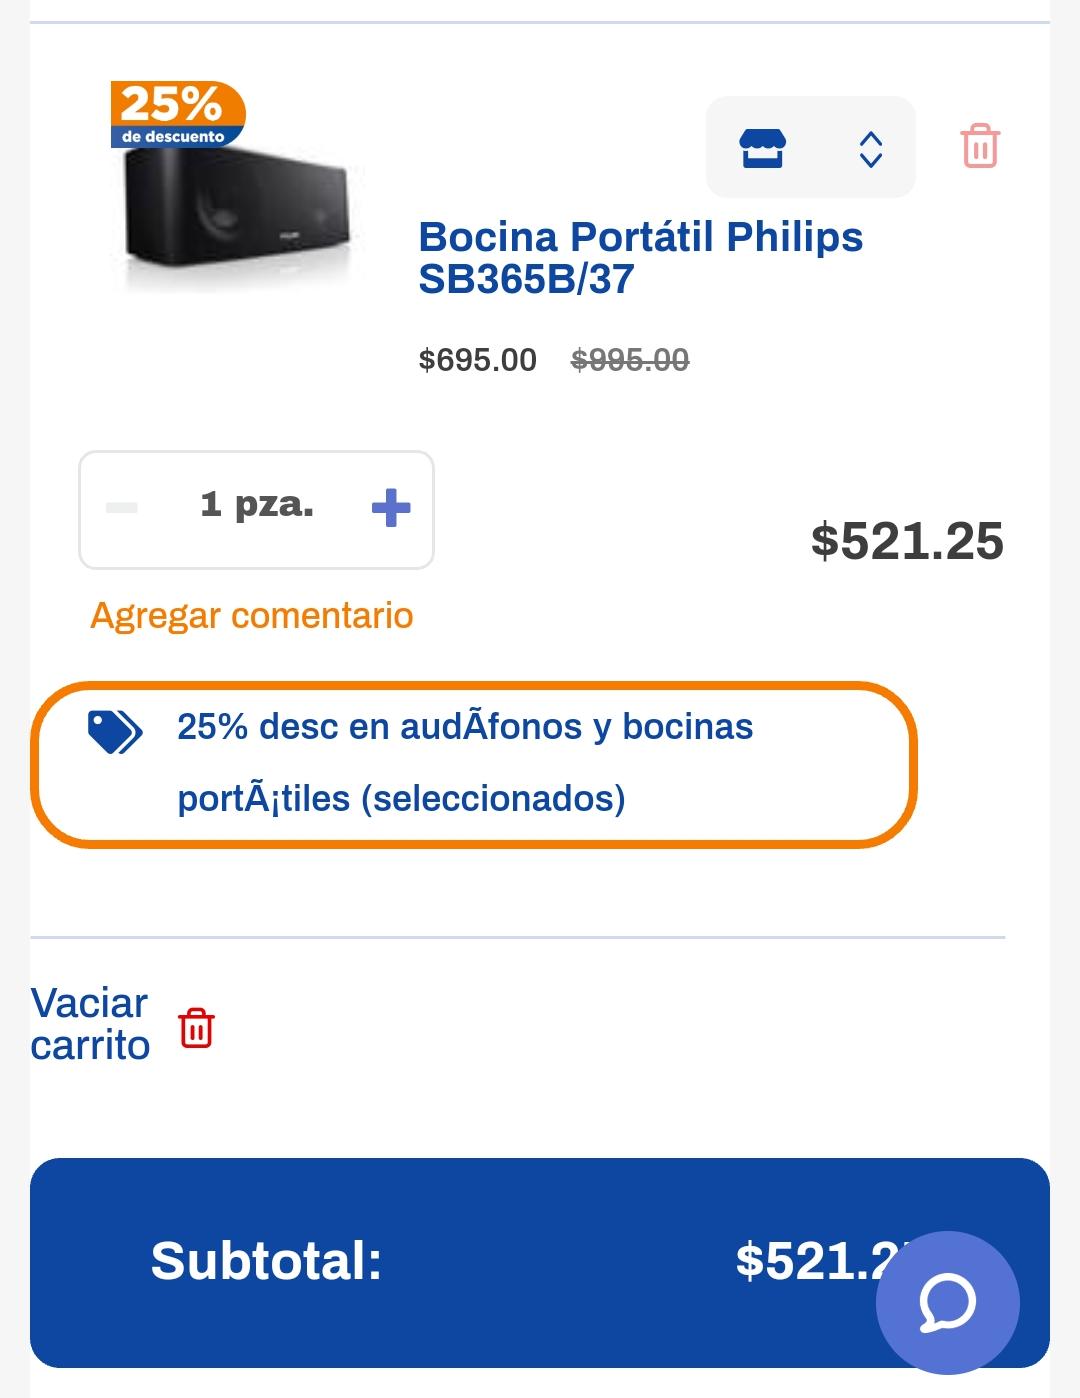 Chedrau: Bocina Portátil Philips SB365B/37